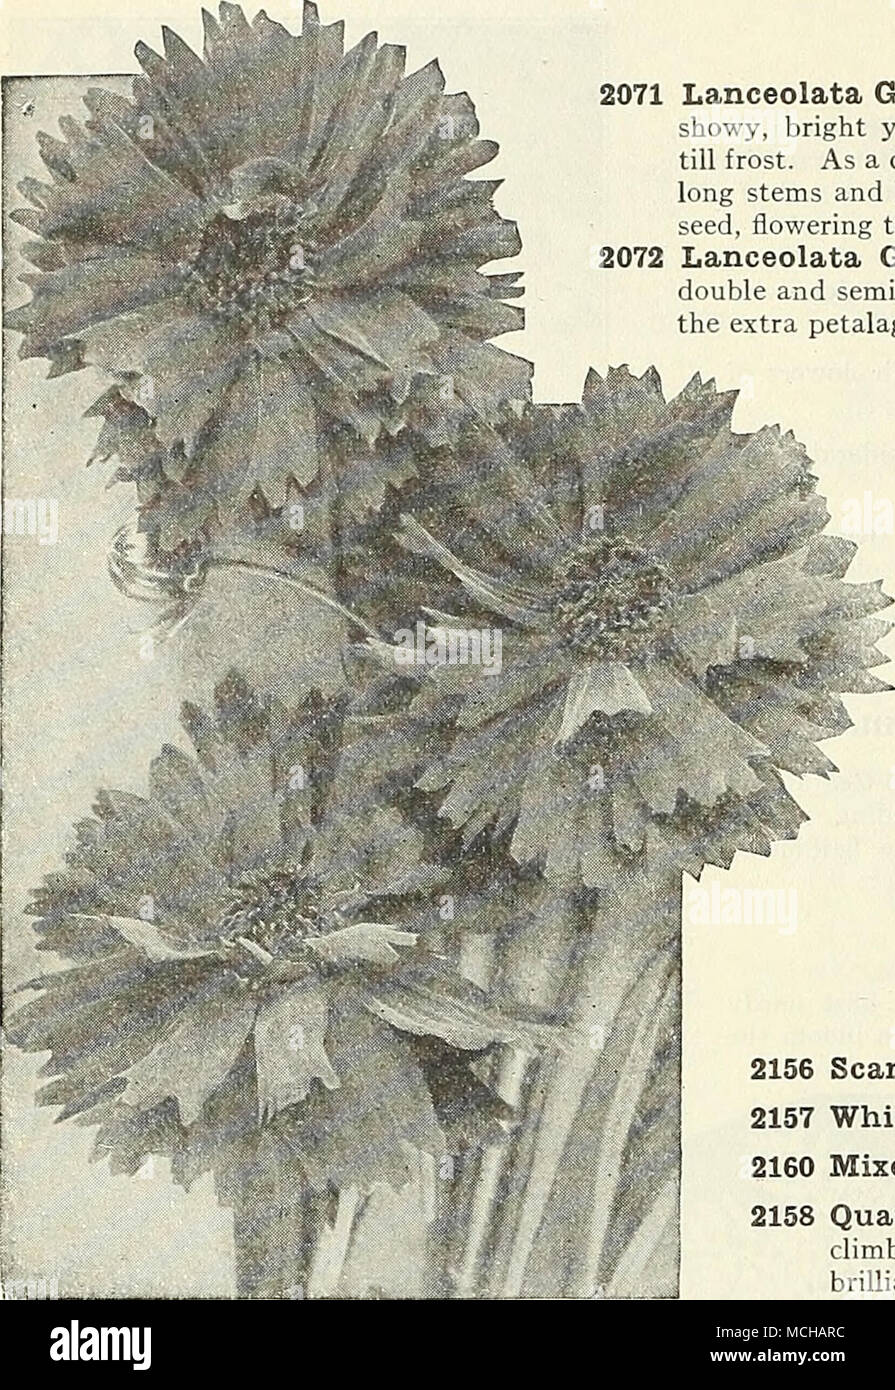 Cowslip Primula Veris 2110 Mixed A Beautiful Hardy Spring